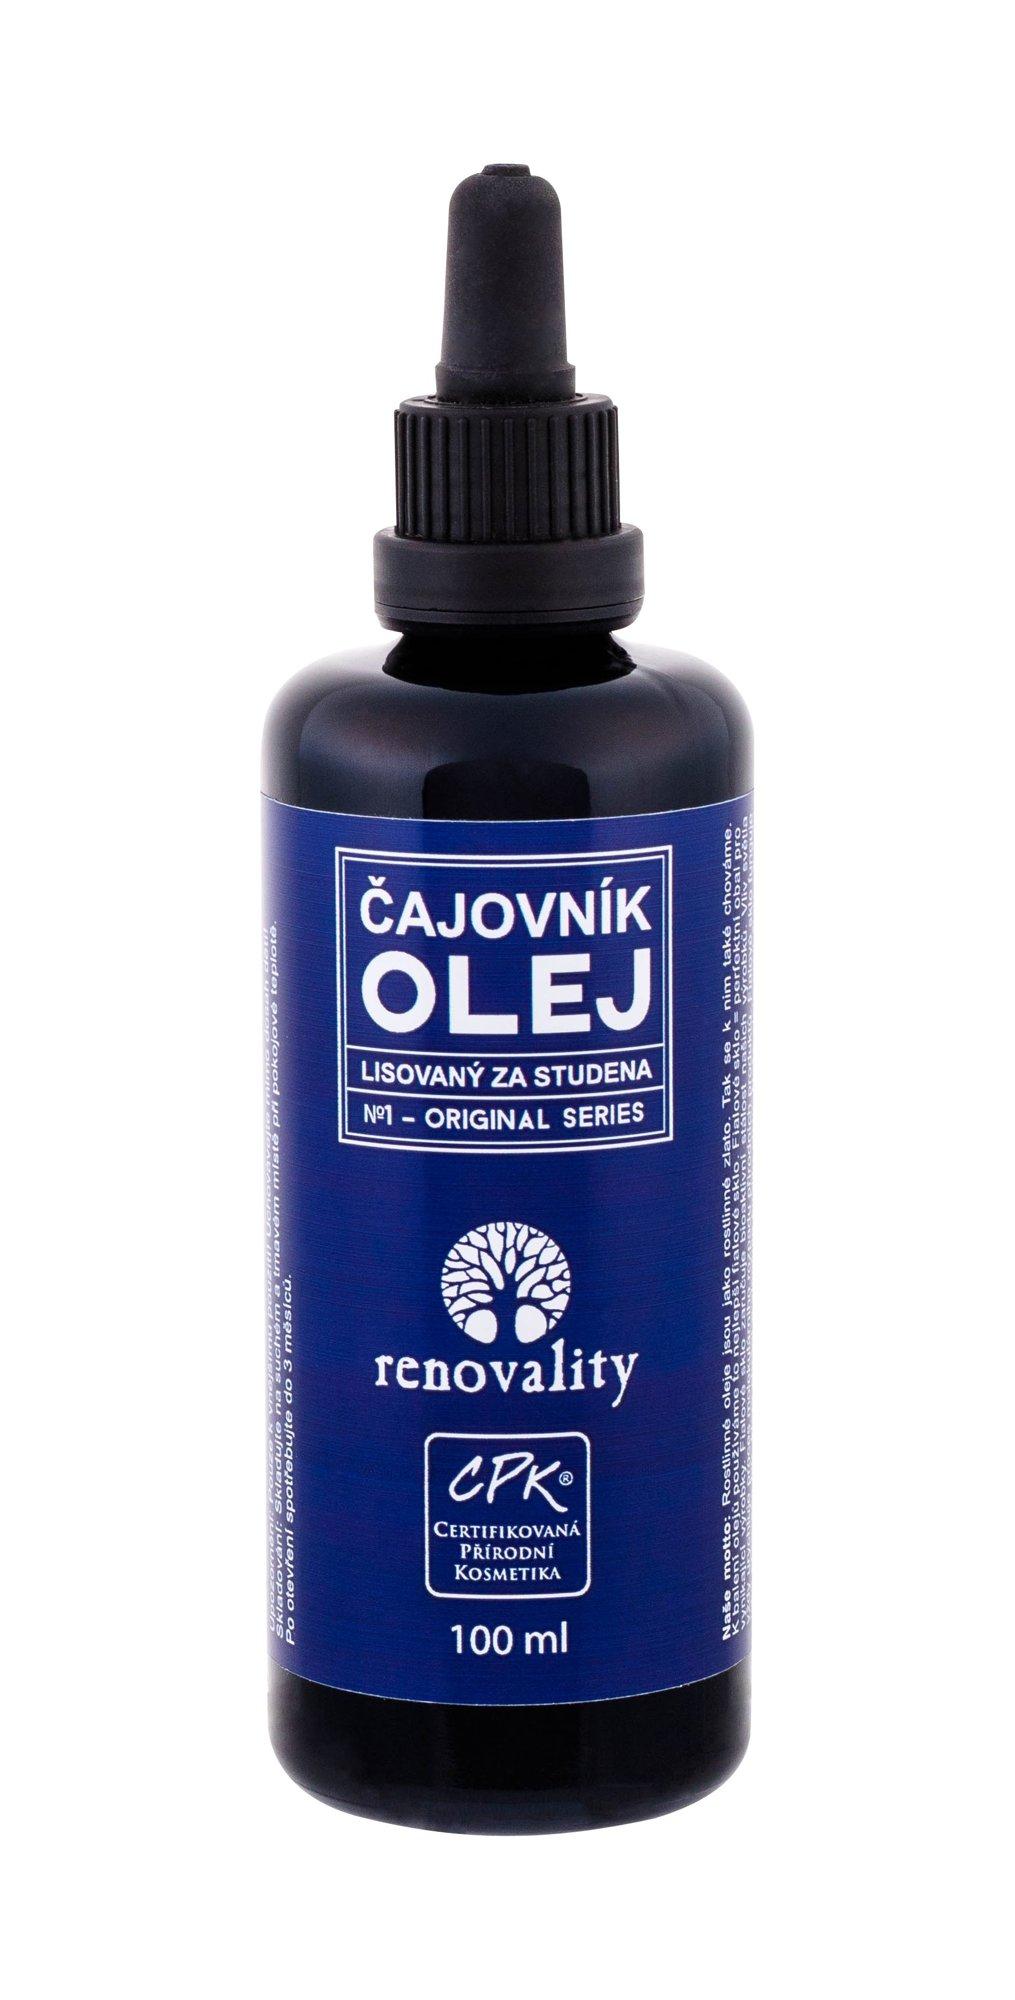 Renovality Original Series Body Oil 100ml  Camelia Oil